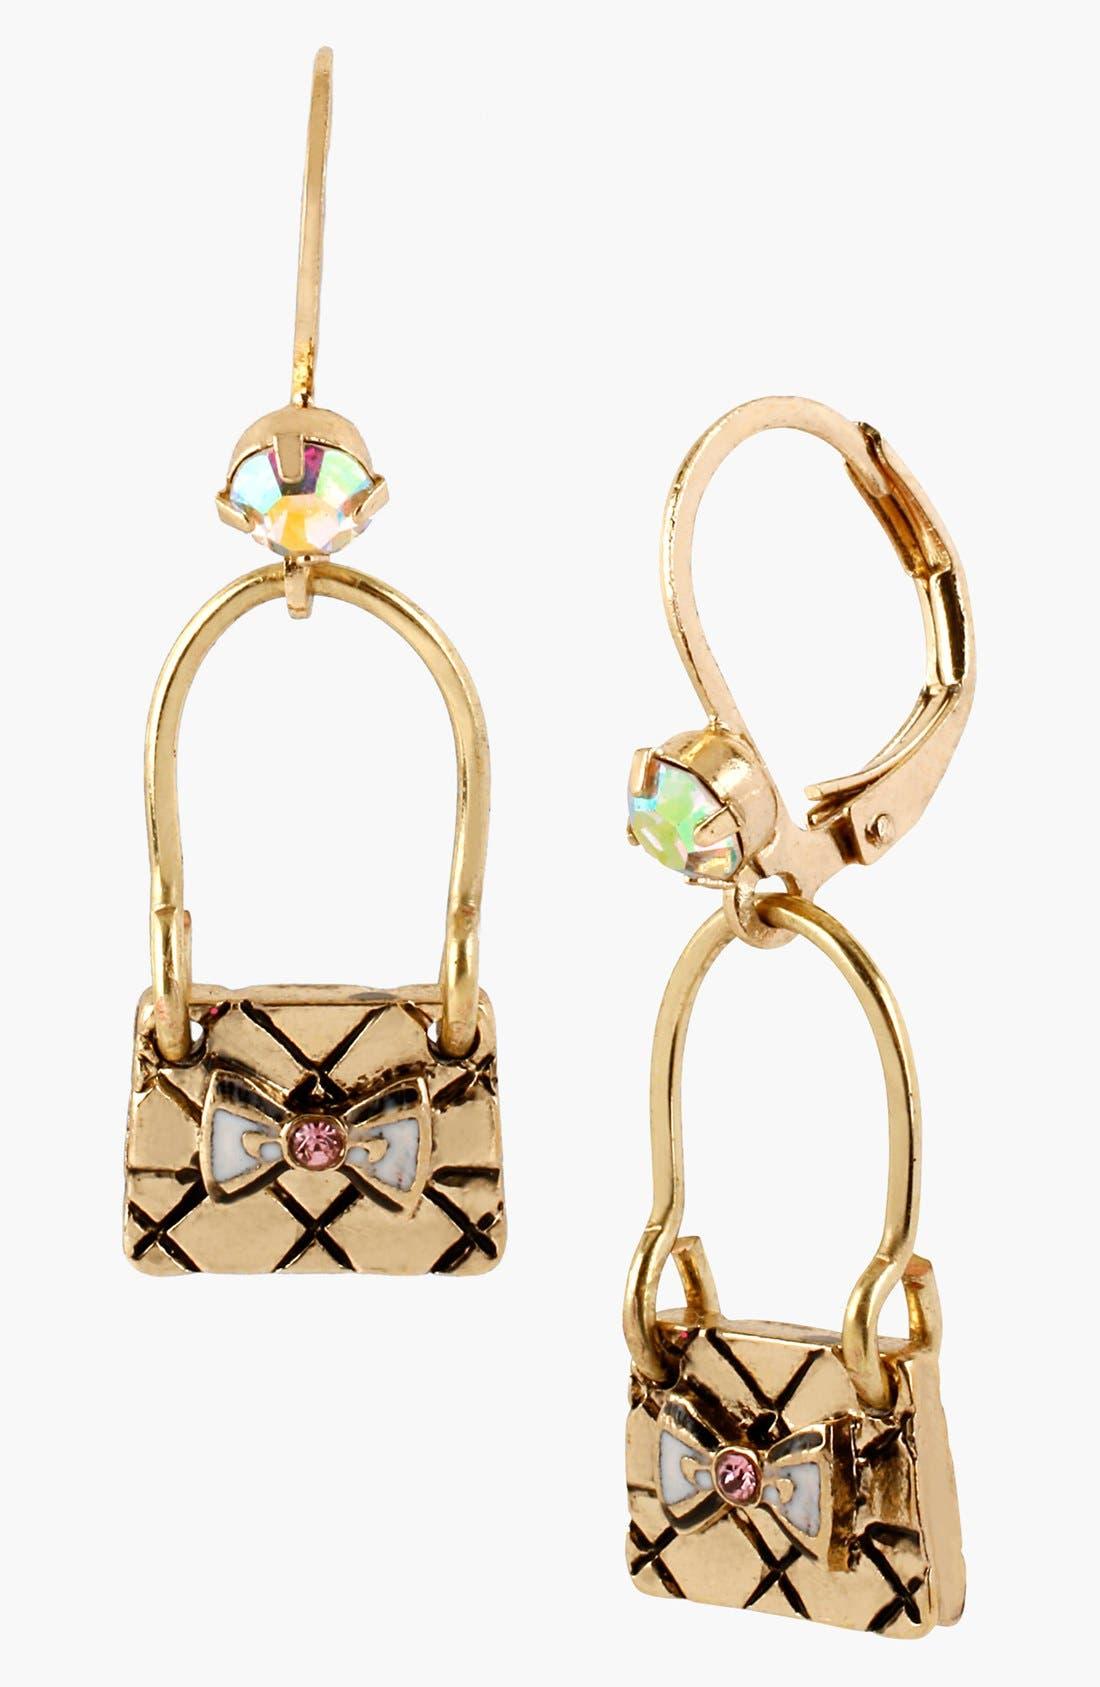 Alternate Image 1 Selected - Betsey Johnson 'Paris' Handbag Drop Earrings